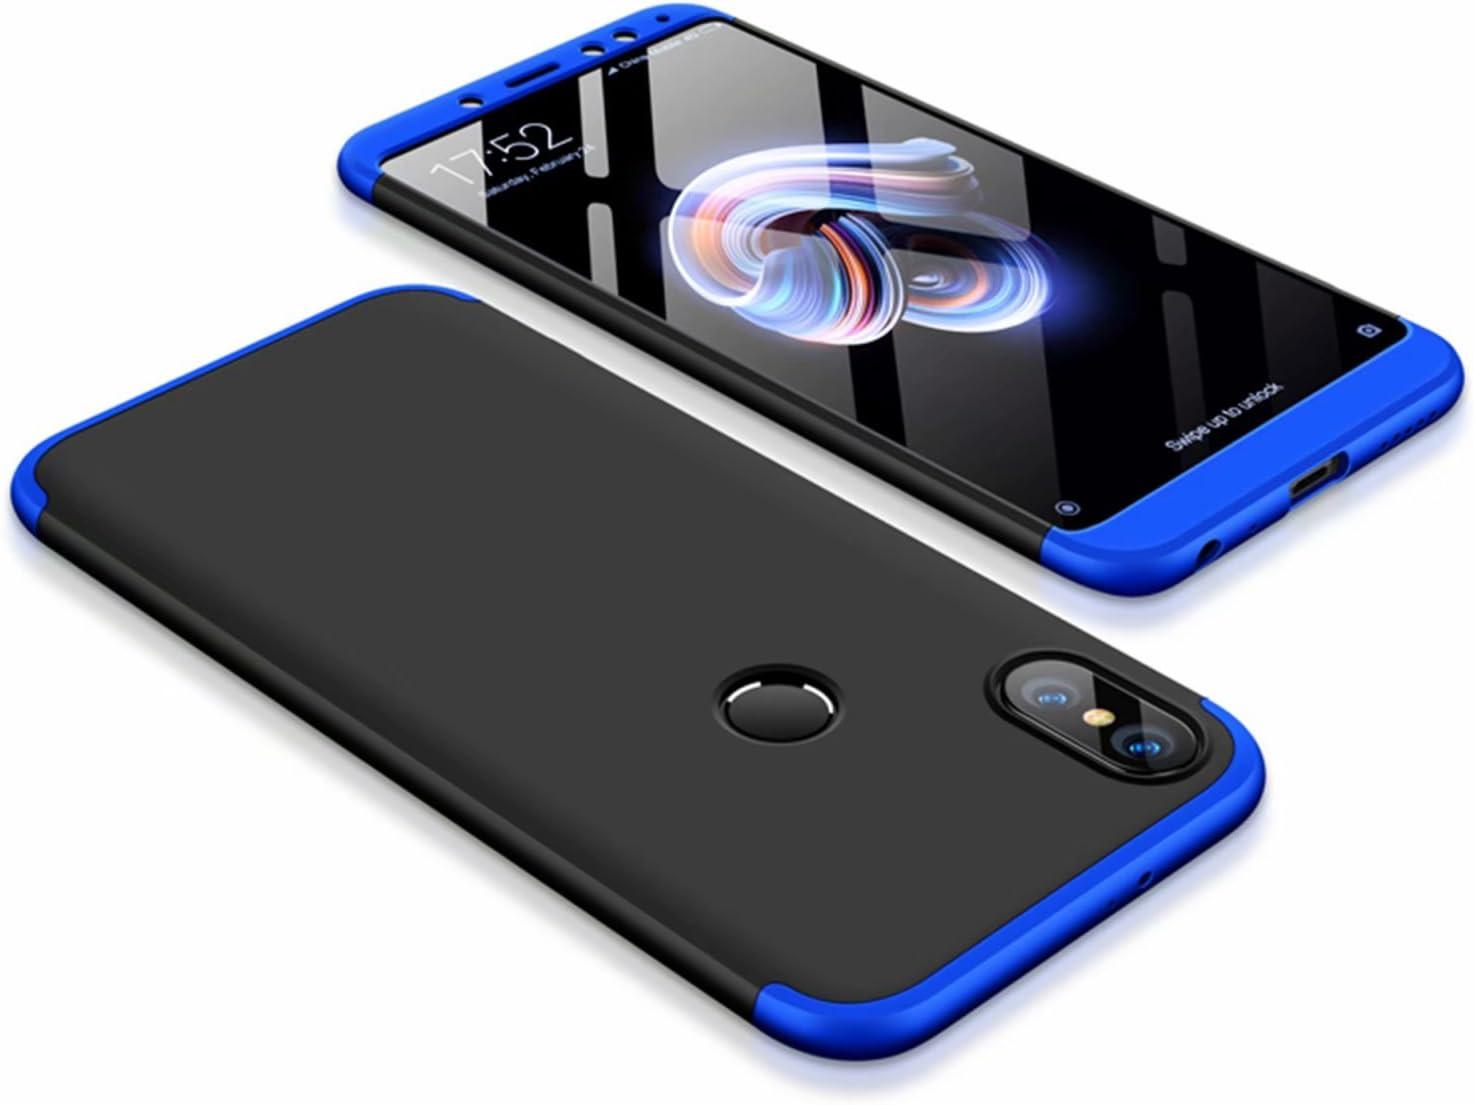 DESCHE compatibles con funda Xiaomi Redmi Note 5 Azul Negro, PC duro Cubierta protectora Ultrafino Anti-rasguños Parachoque Mate Phone Case - Azul Negro